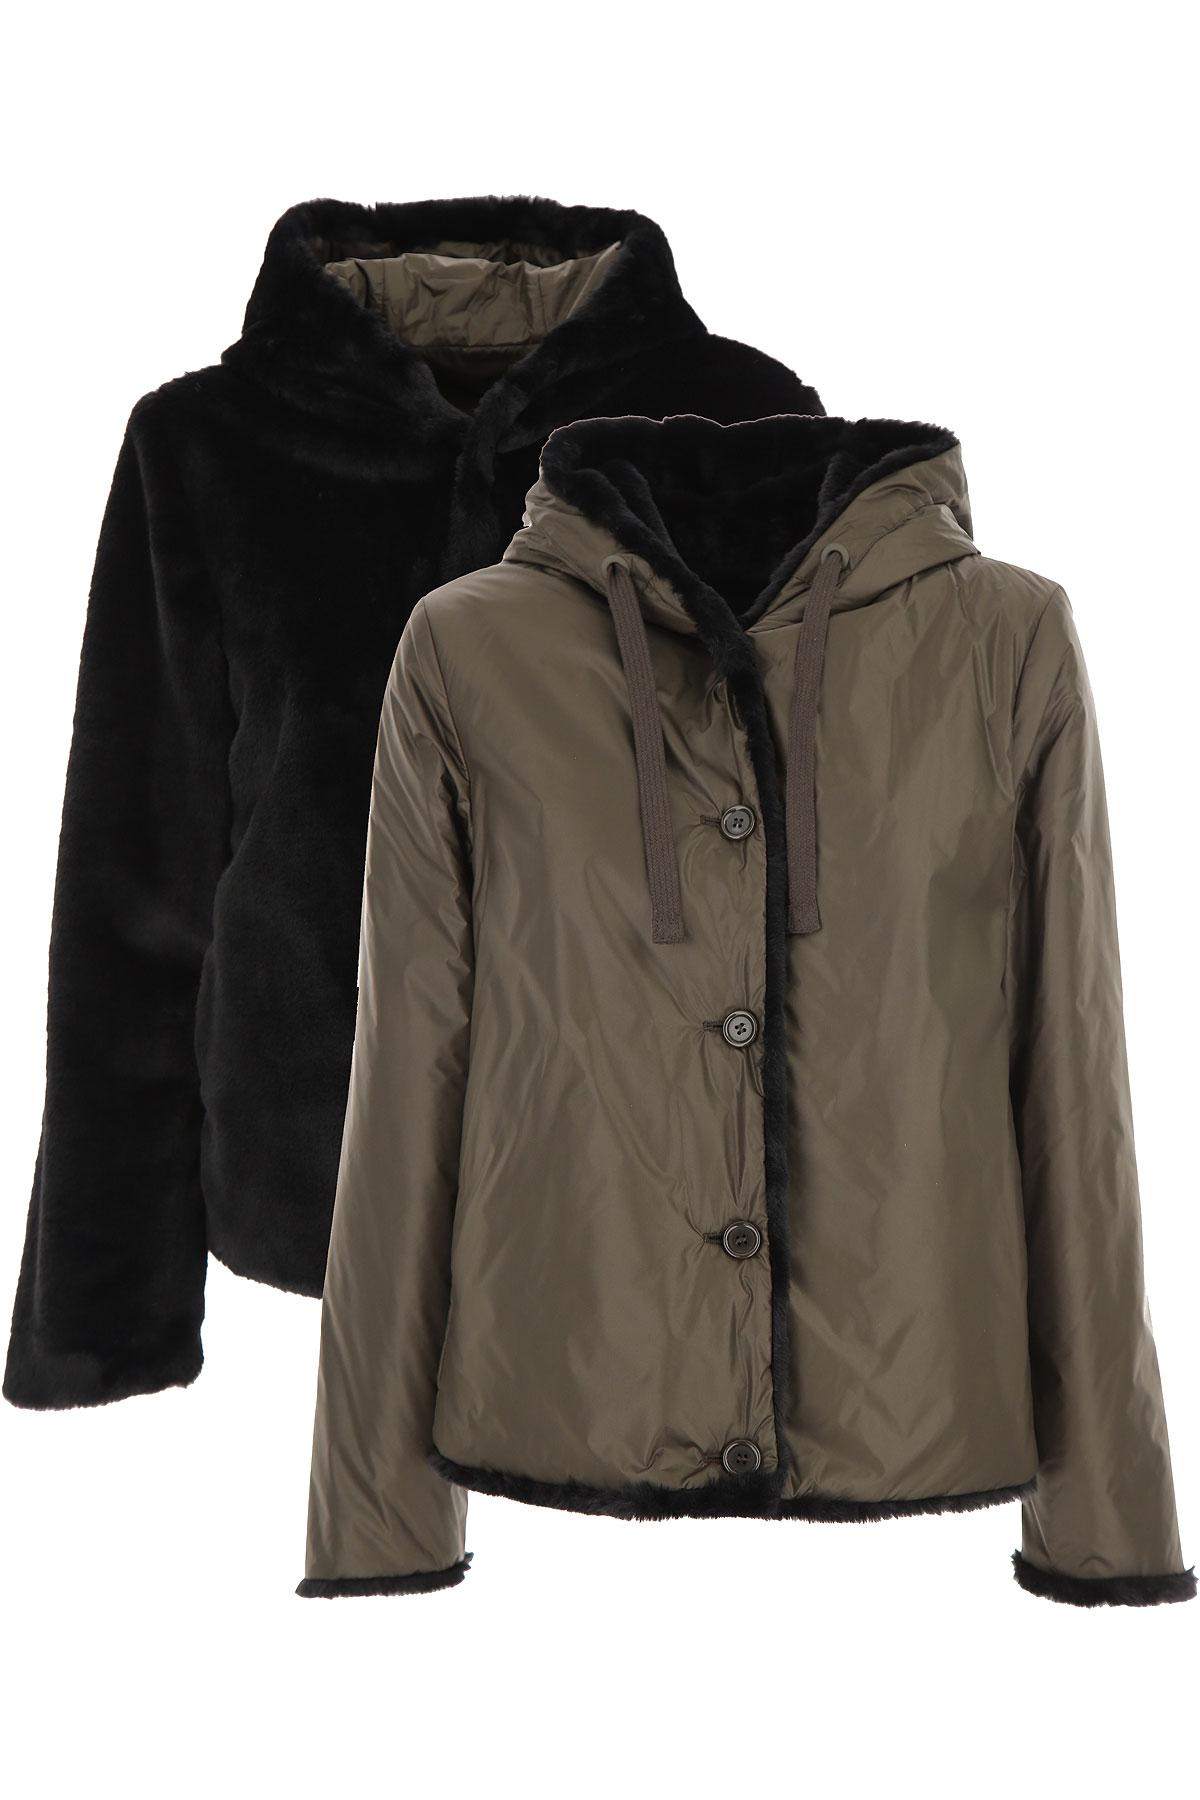 Aspesi Jacket for Women On Sale, Green Olive, polyamide, 2019, 4 8